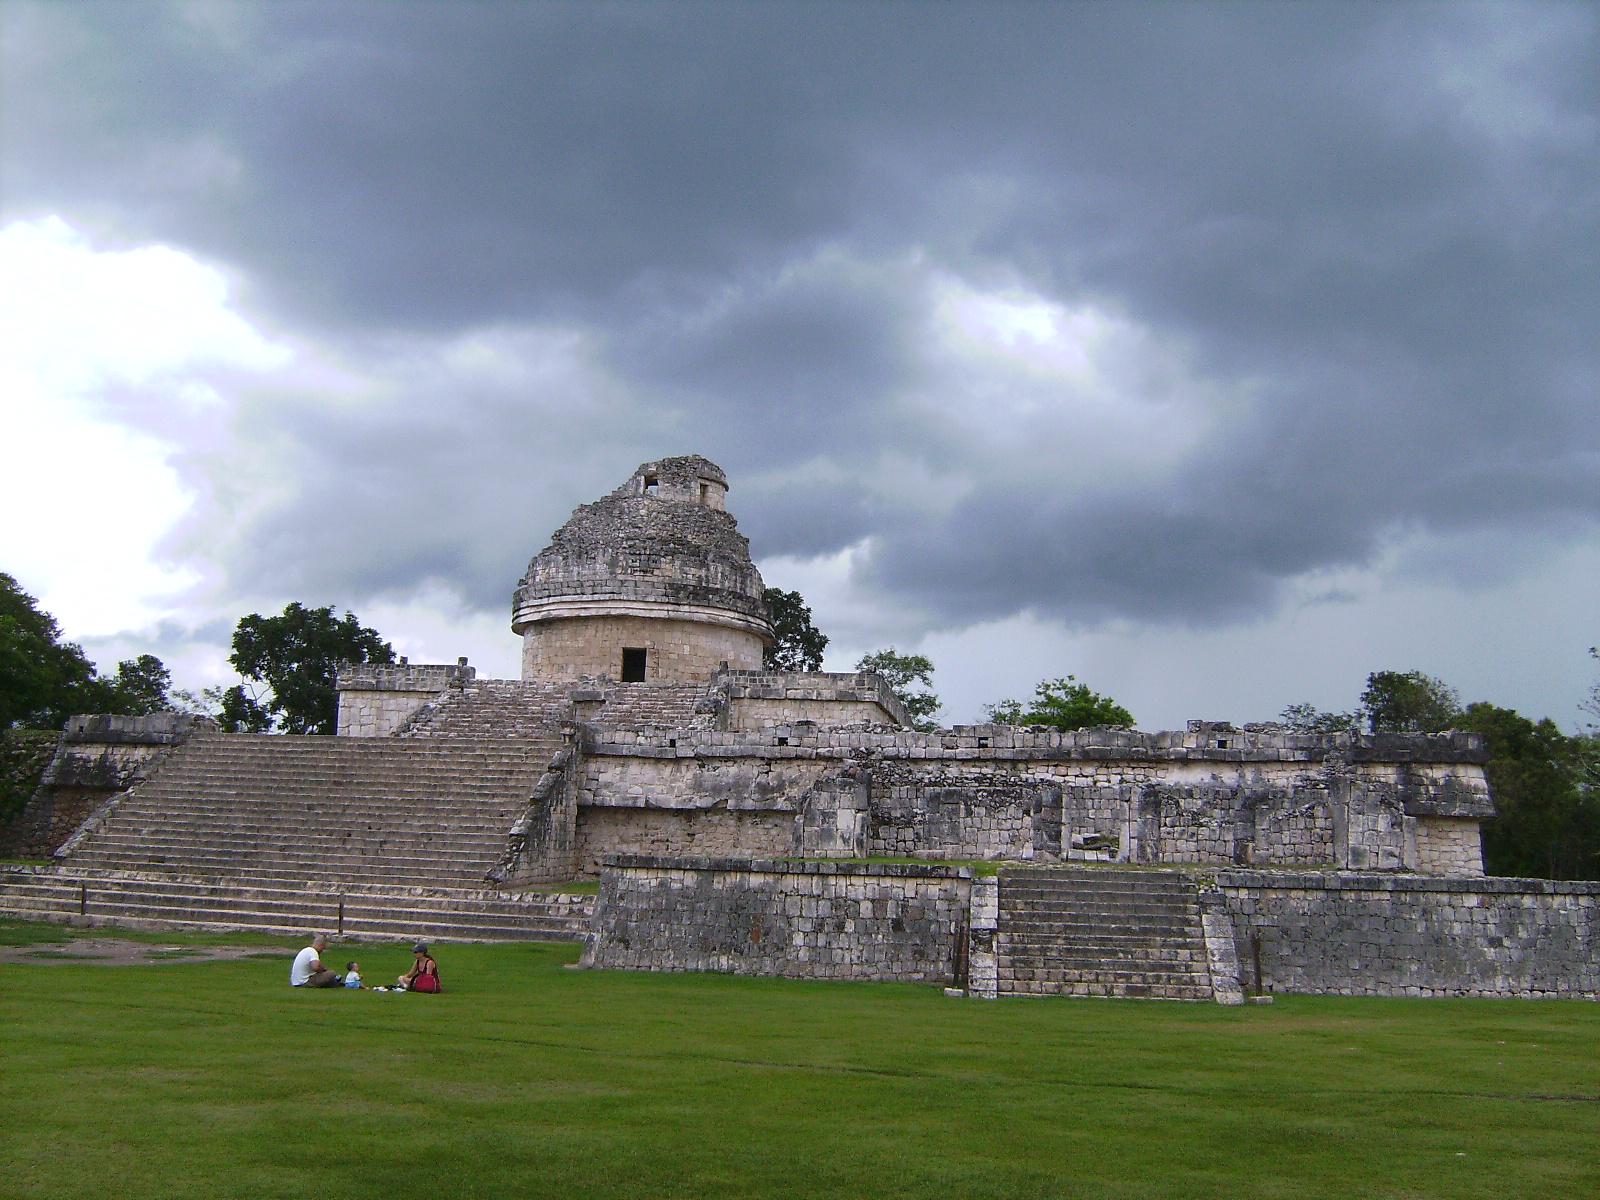 Observatorio de Chichen Itzá @ Marc